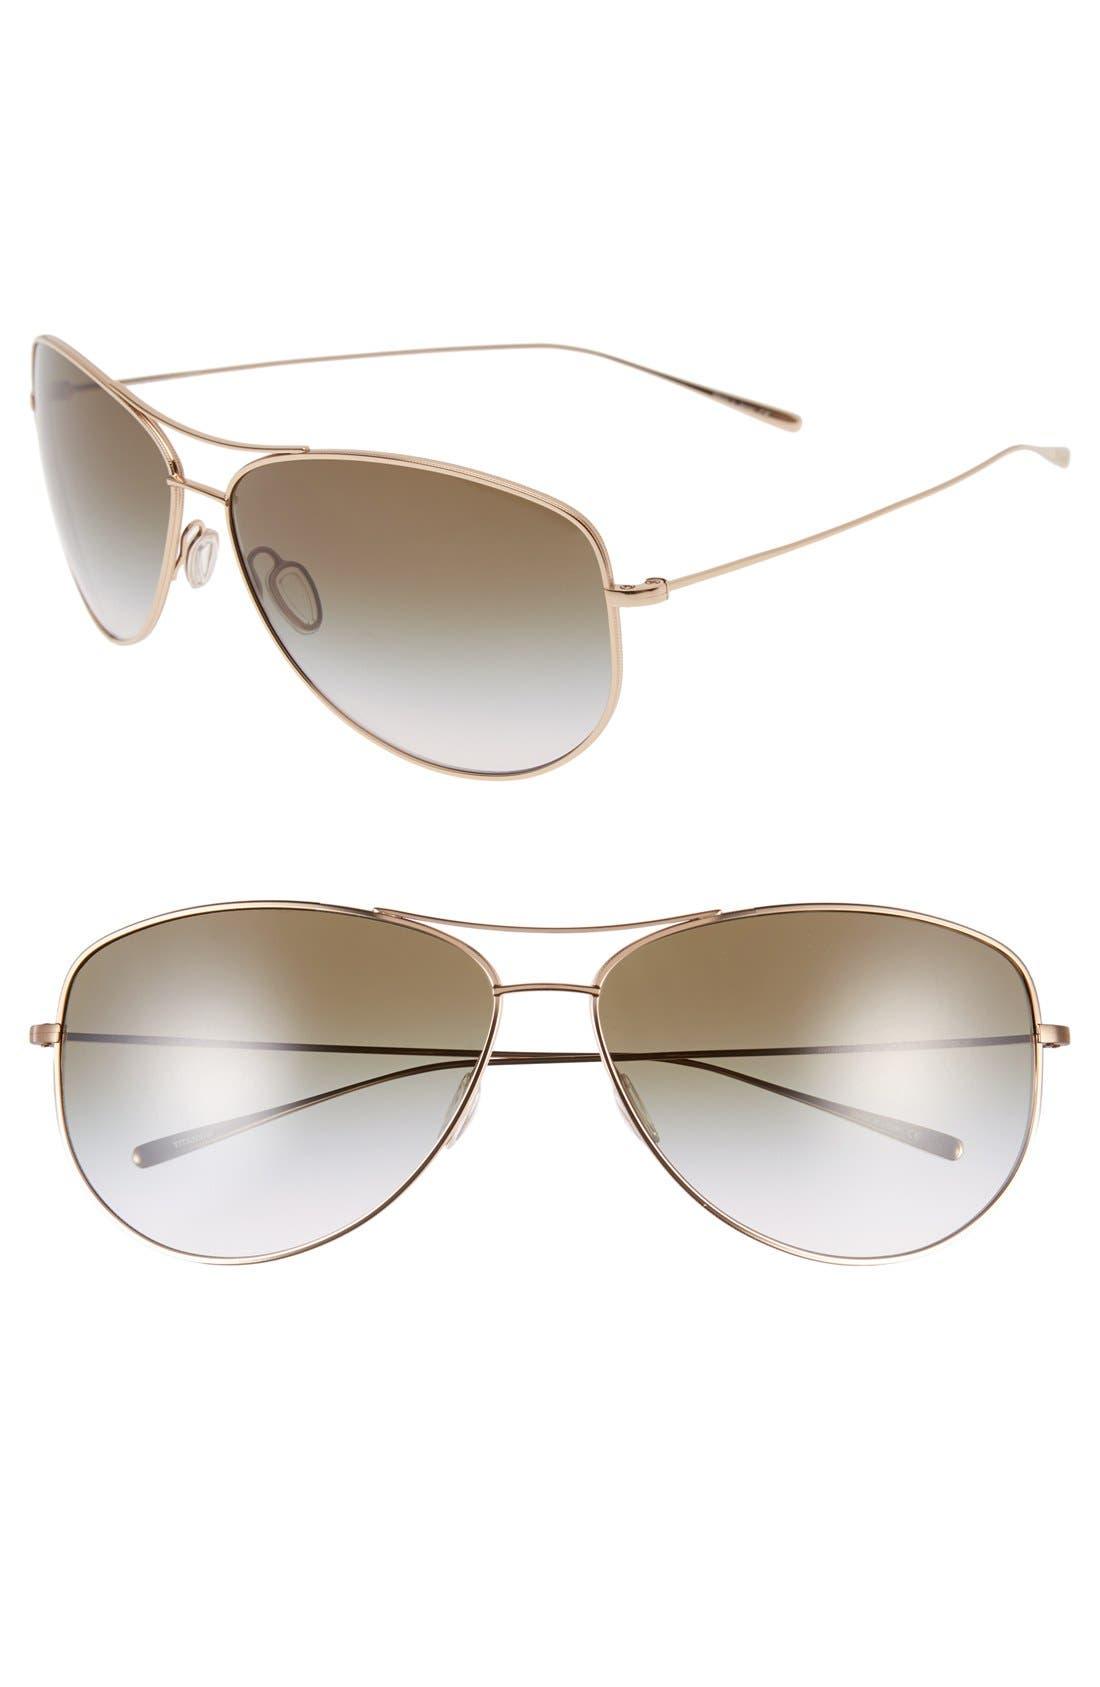 Main Image - Oliver Peoples 'Kempner' 65mm Aviator Sunglasses